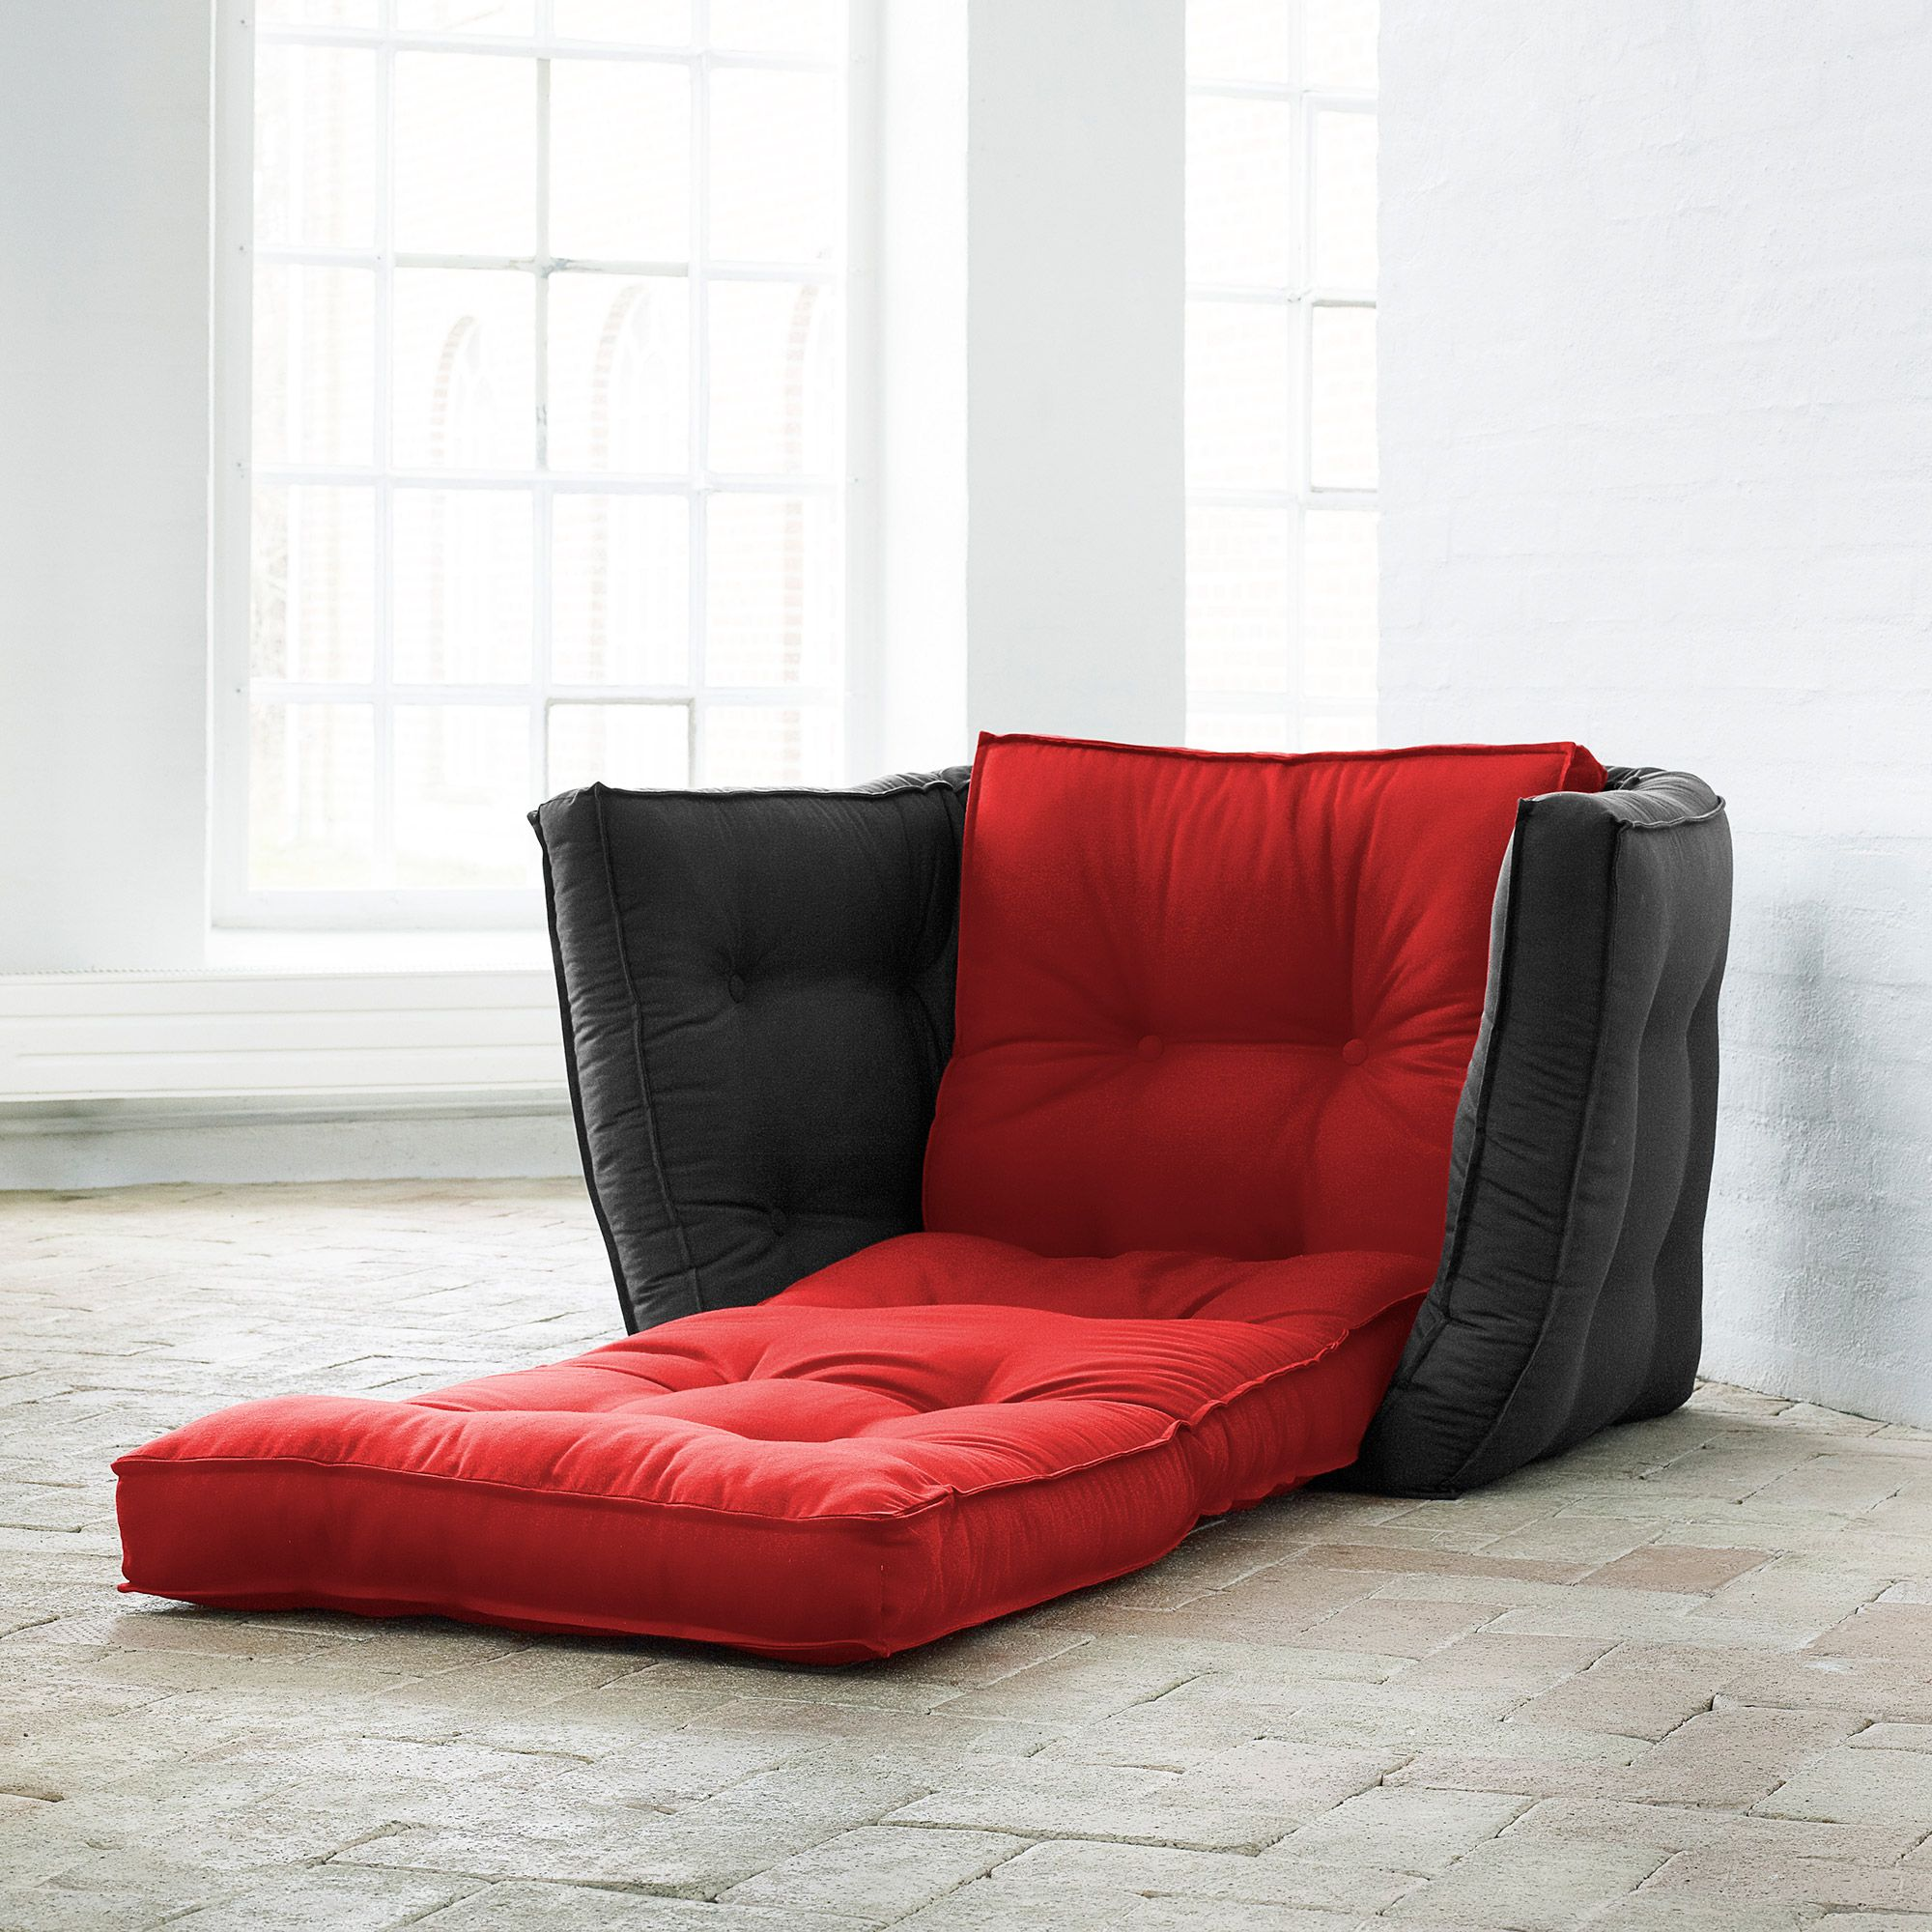 Chauffeuse bicolore convertible matelas futon DICE FUTON CHAIR